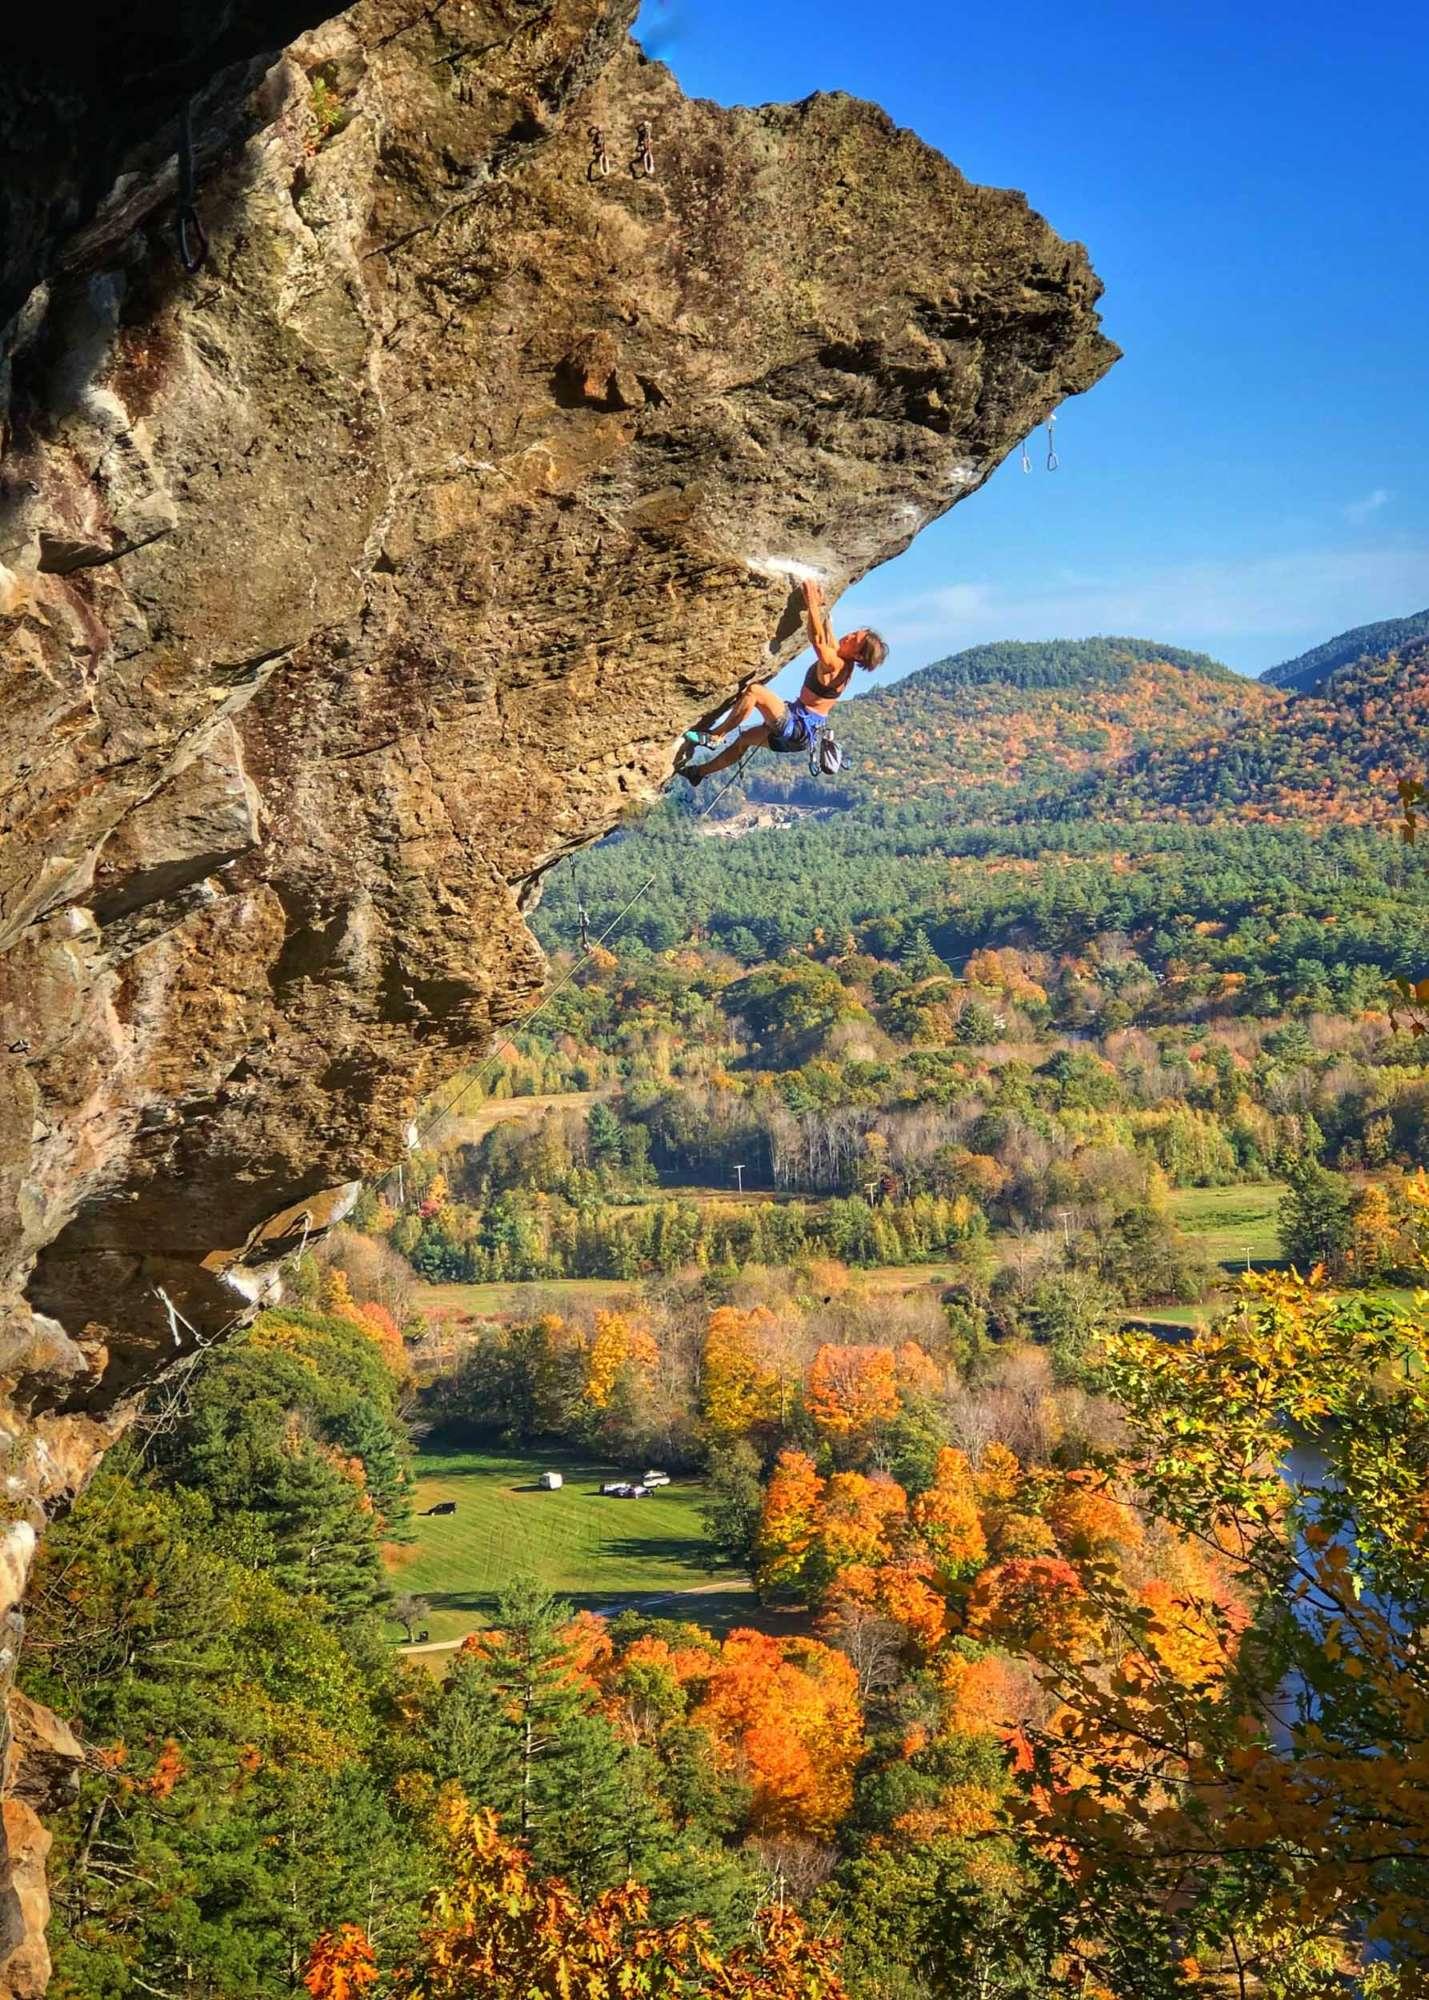 mountain-climbers-soaring-to-new-heights-photographer-Benoit-LeBlanc-vie-en-montagne-Annie-Chouinard-New-Hampshire